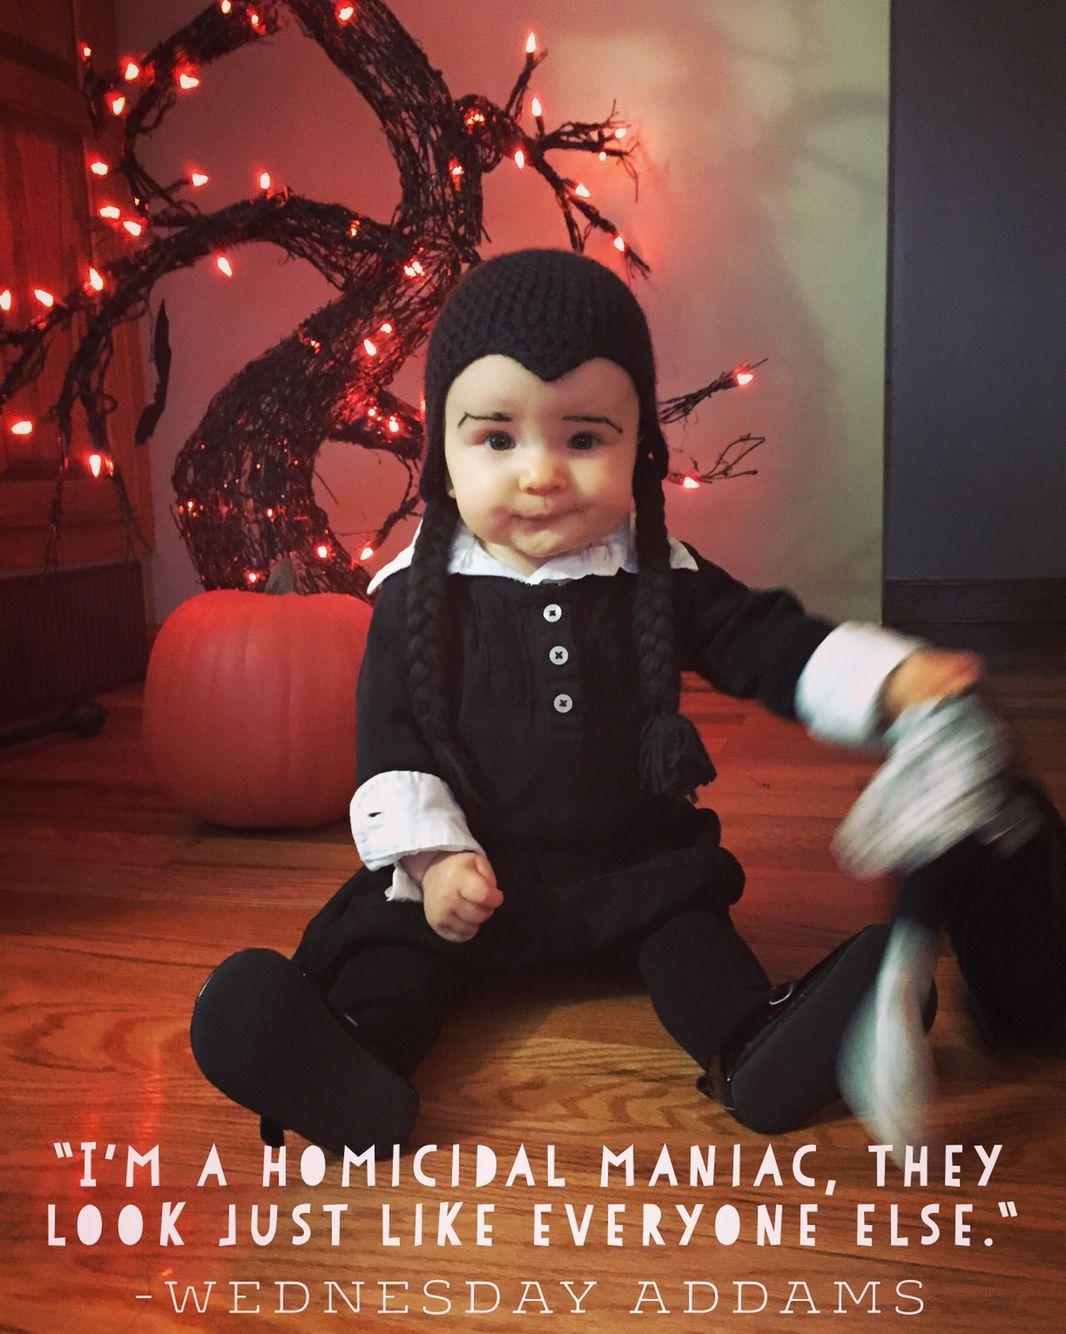 Wednesday Addams baby costume! Crochet wig/hat  sc 1 st  Pinterest & Wednesday Addams baby costume! Crochet wig/hat | Halloween ...